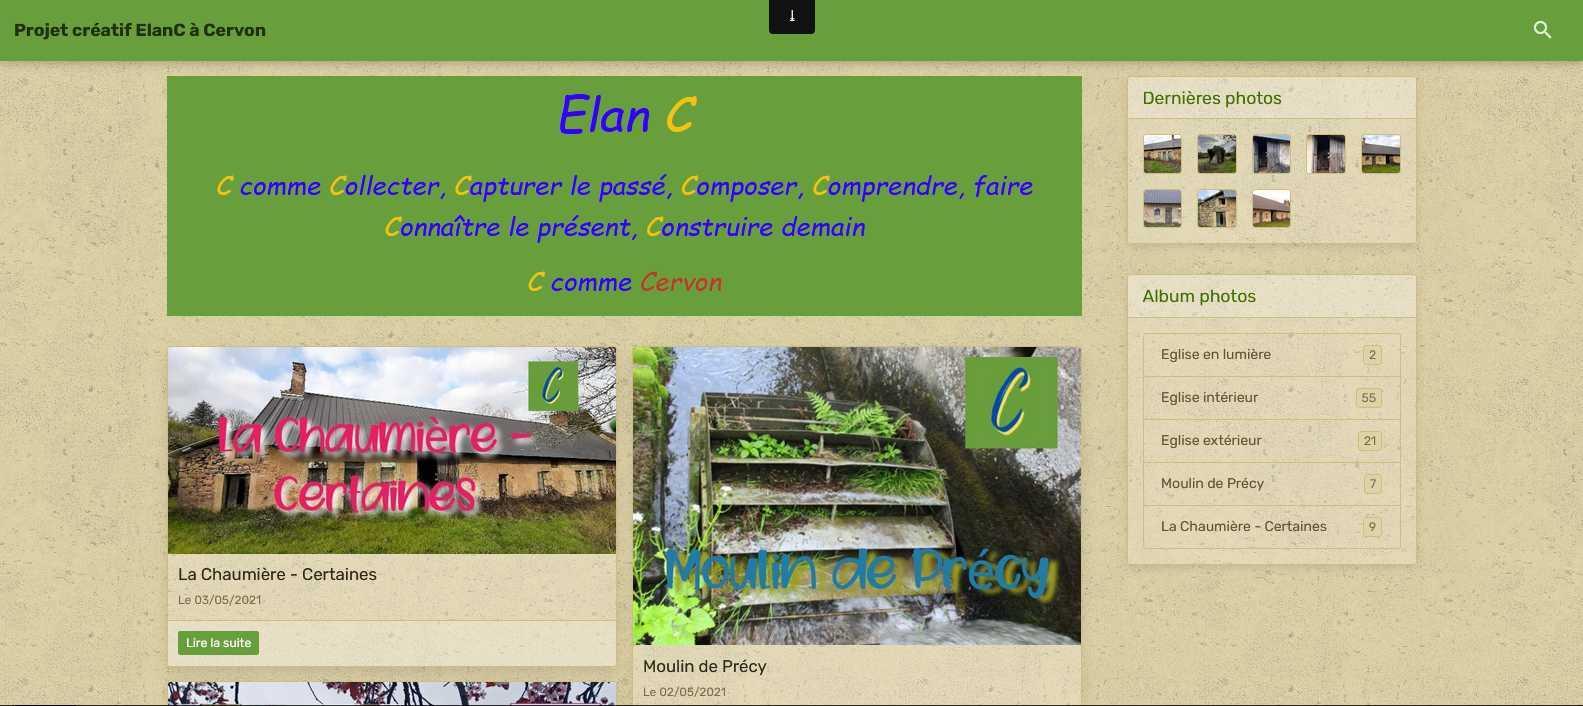 Elanc